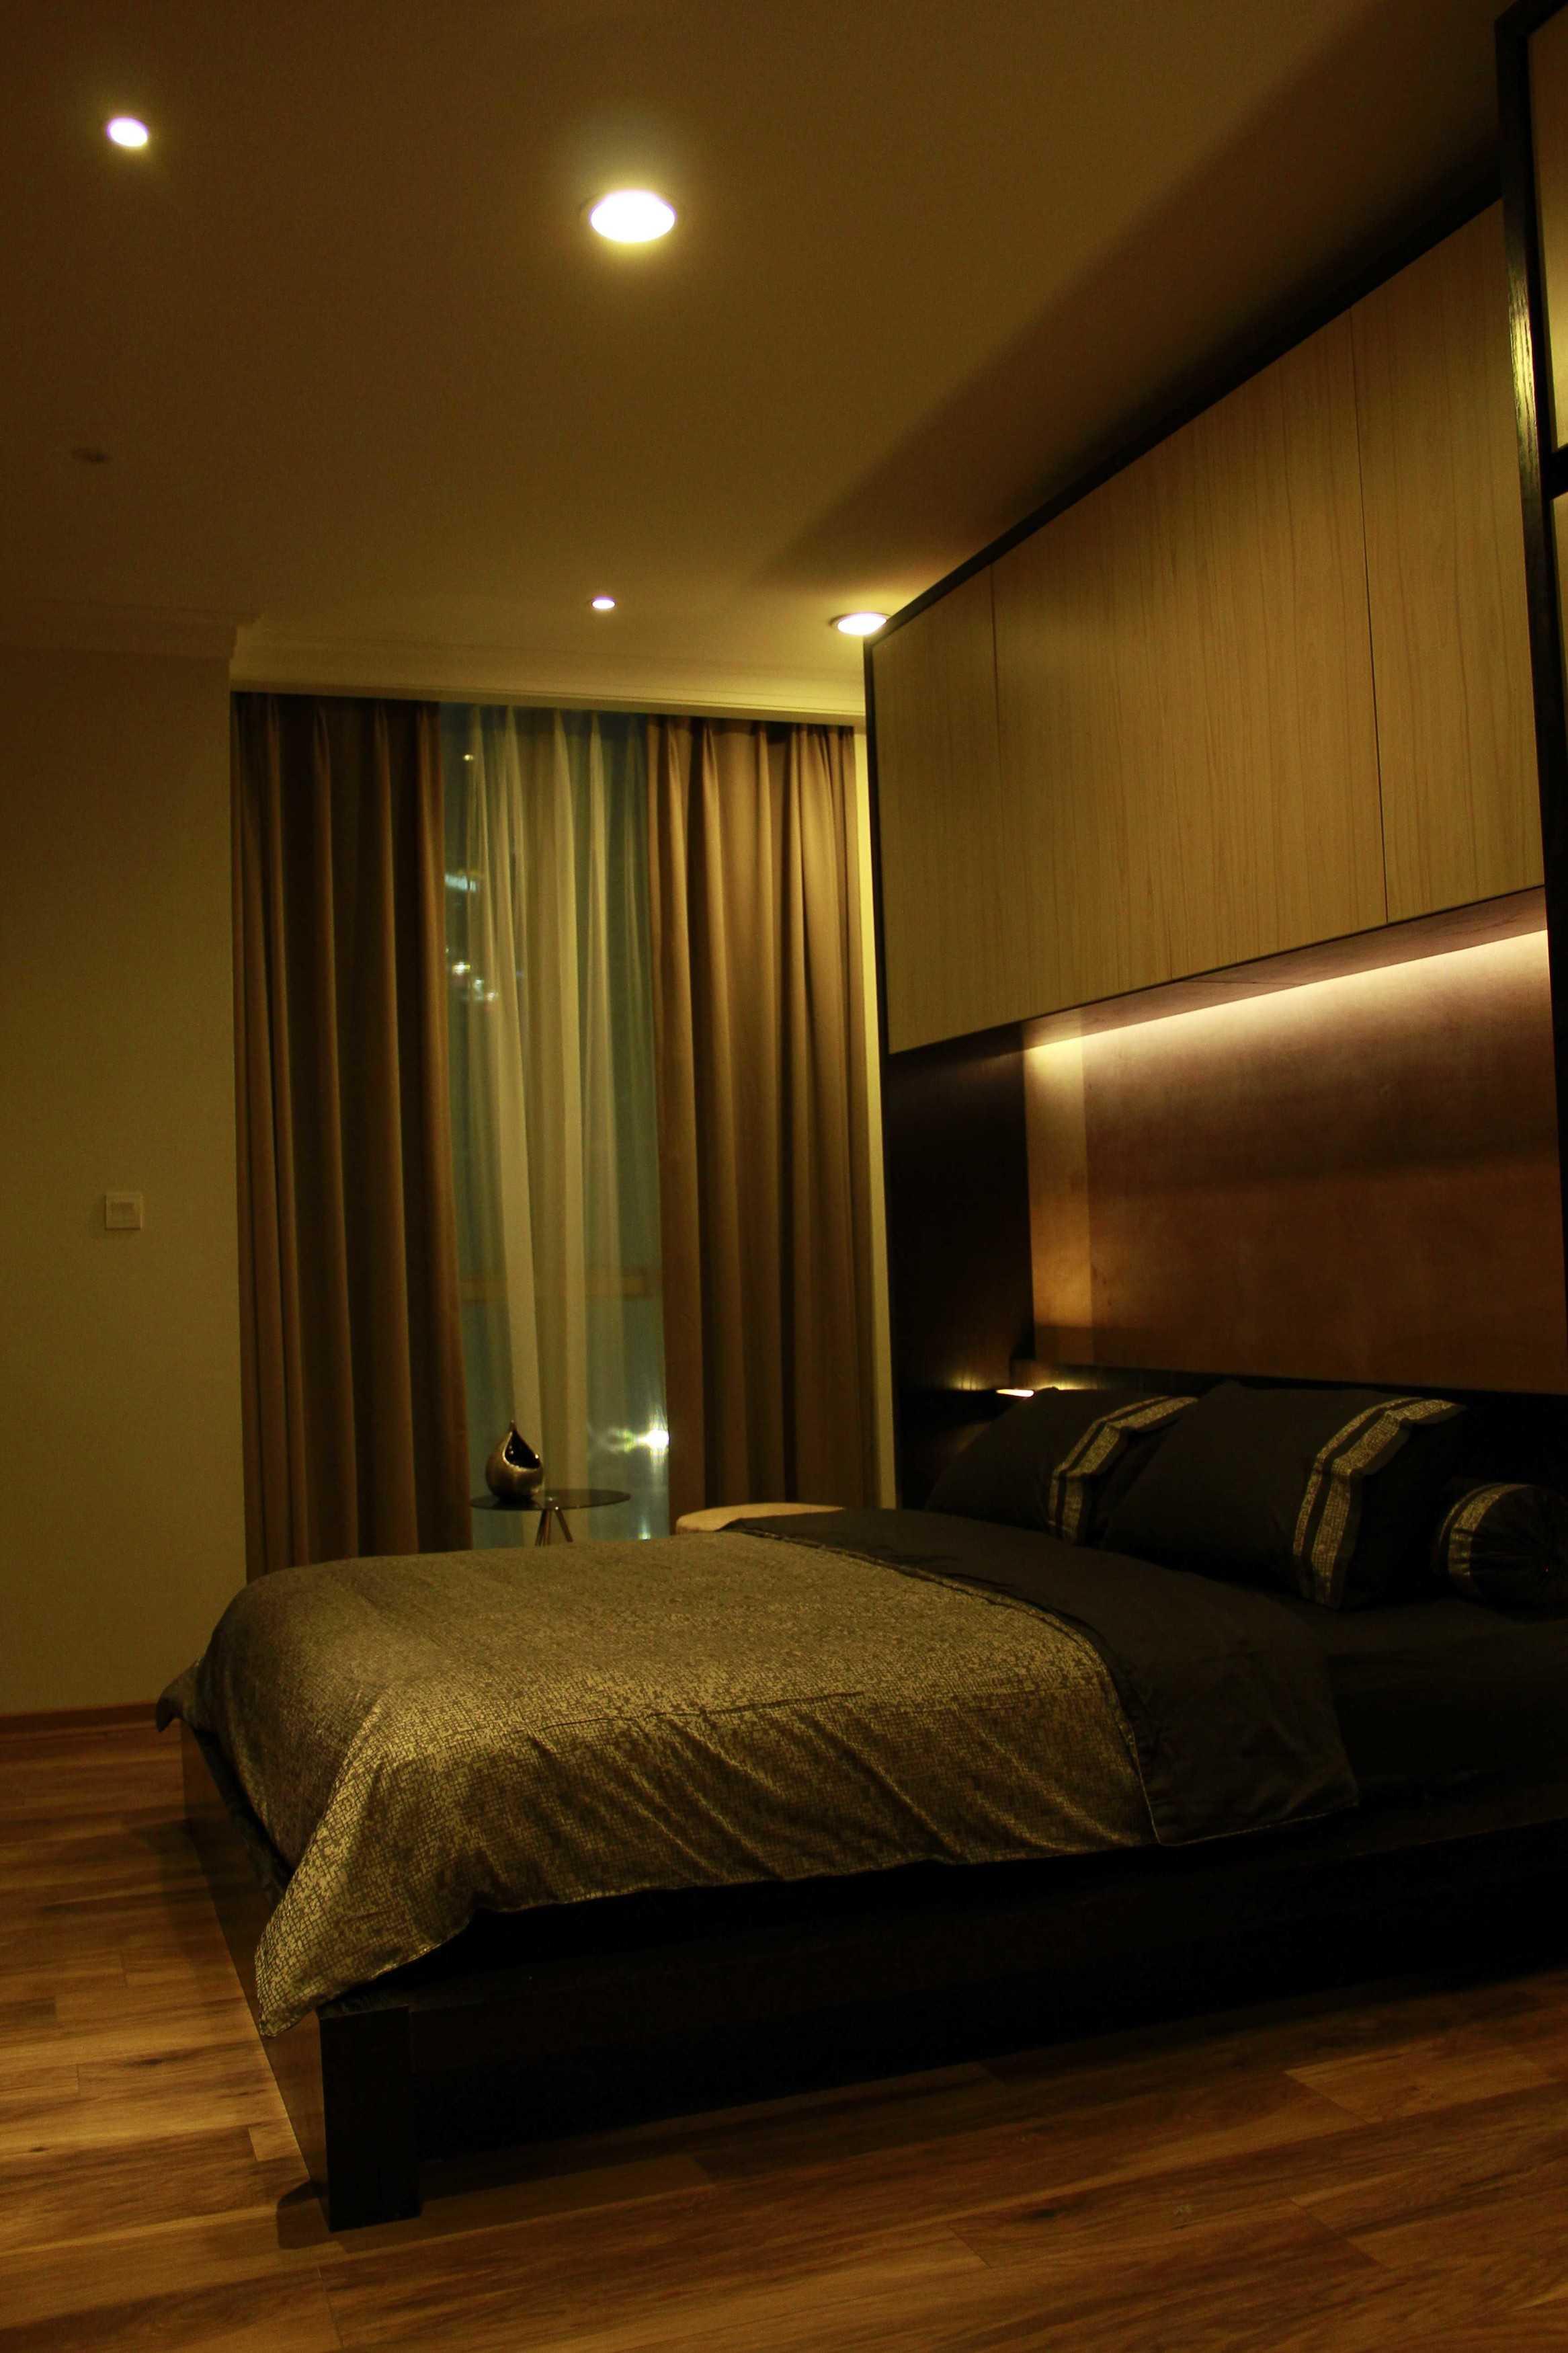 Dimas Andrea 2Br Unit - Residence 8 Jakarta Selatan Jakarta Selatan Bedroom Modern  23676